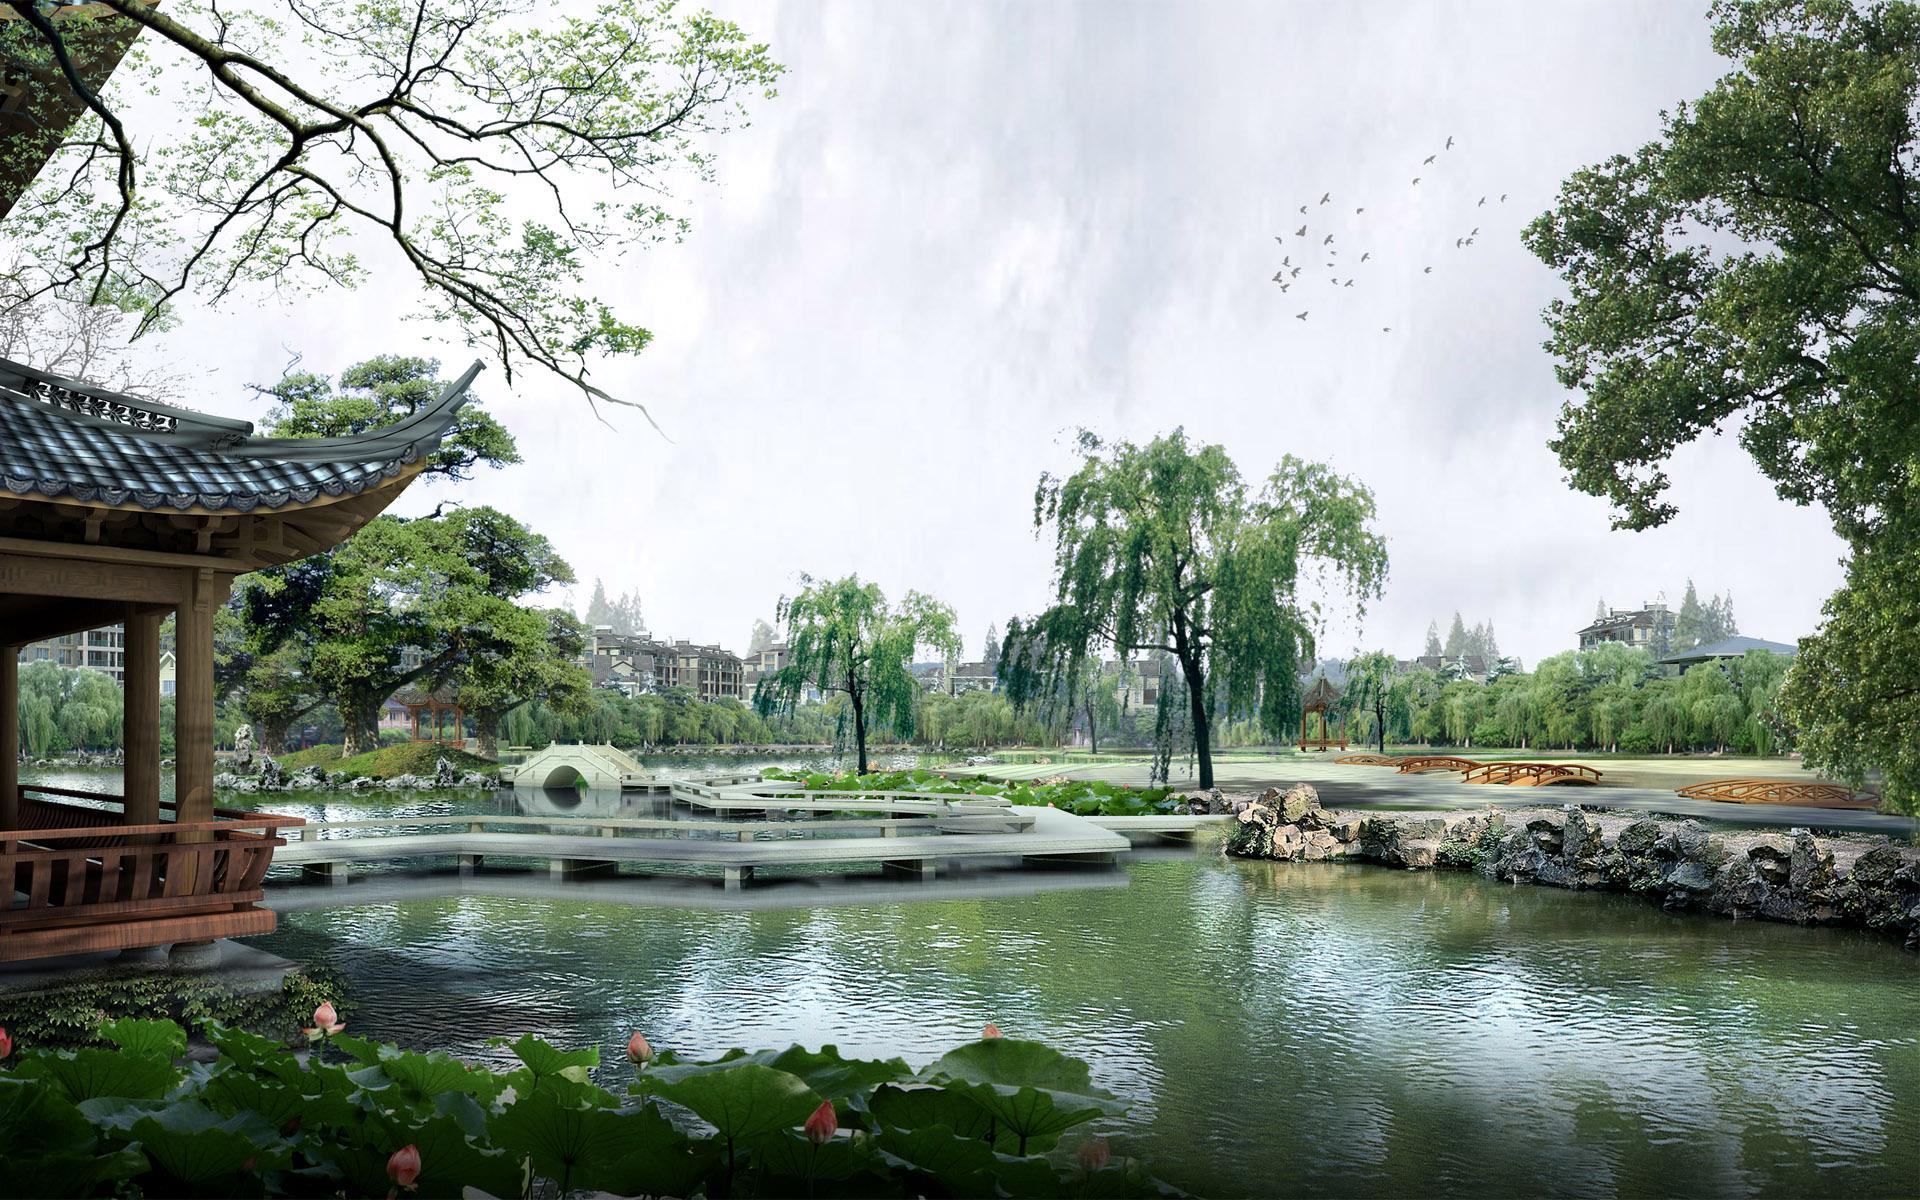 xinhua china anhui laian pond cypress scenery scenery - HD2560×1600